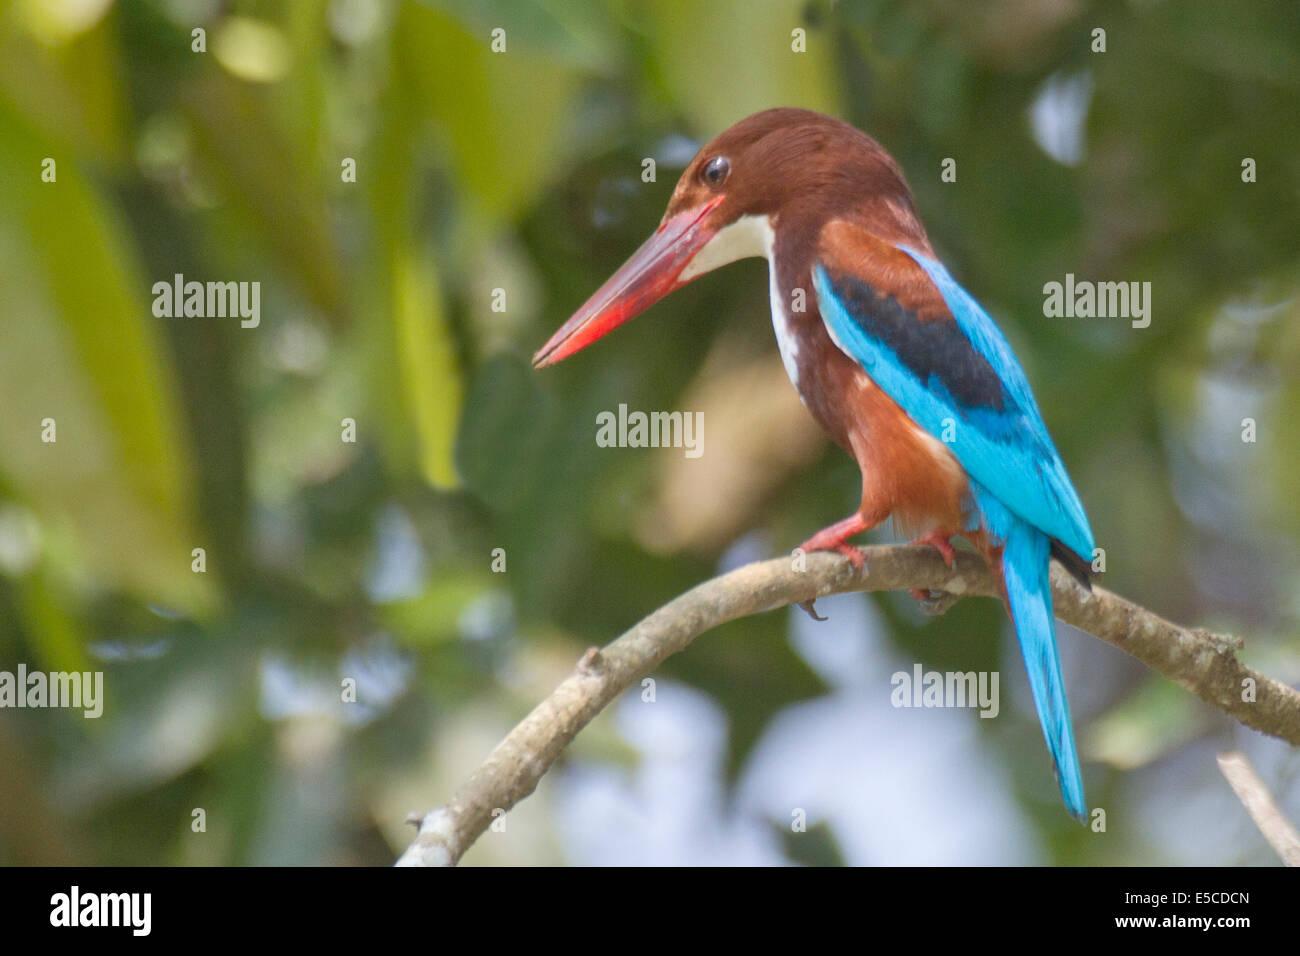 WhiteThroated Kingfisher.(Halcyon smyrnensis).Kerala Backwaters,India - Stock Image